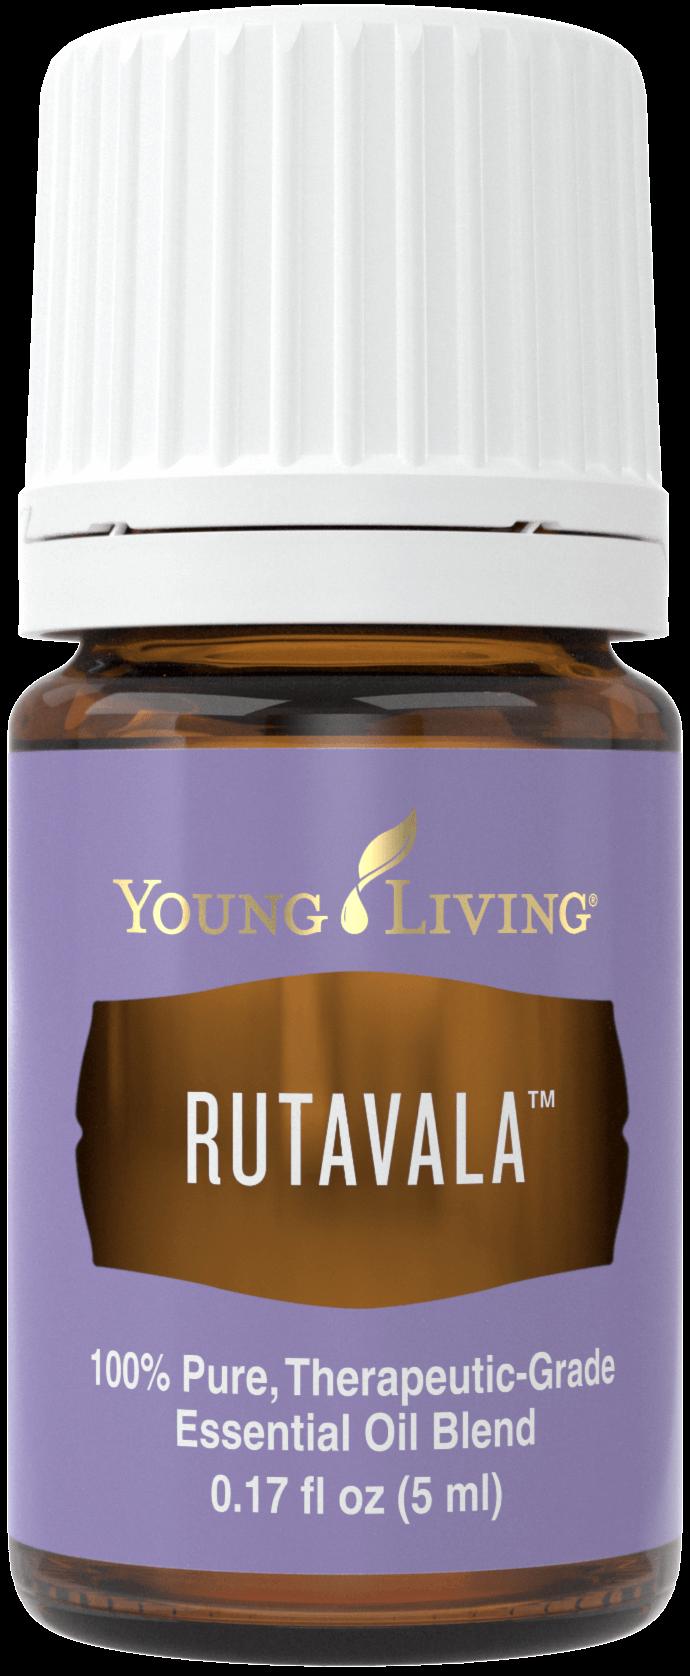 Ätherisches Öl Young Living: RutaVaLa (Schlaf) 5ml